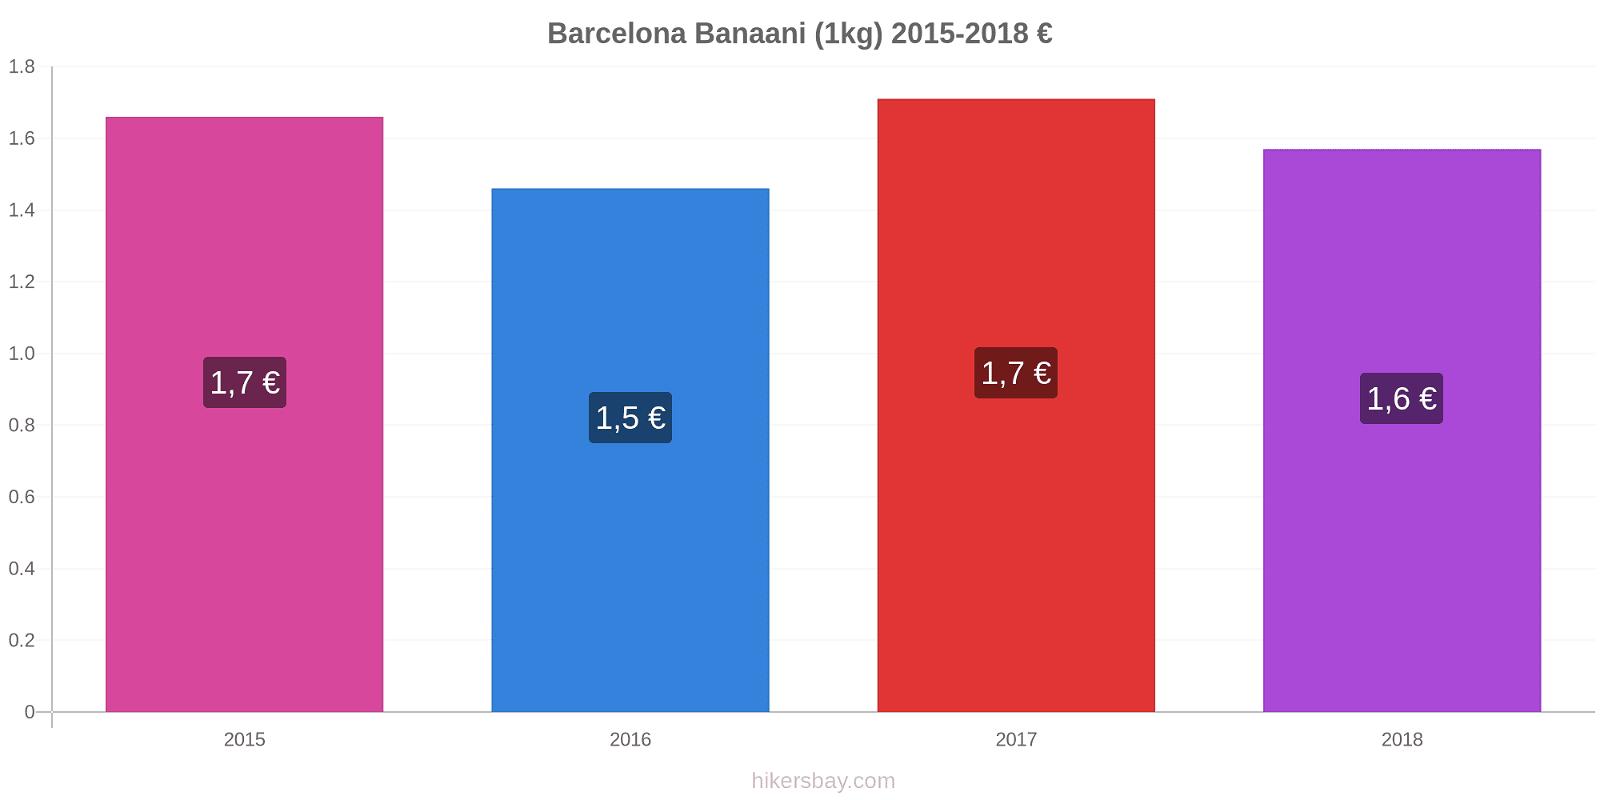 Barcelona hintojen muutokset Banaani (1kg) hikersbay.com